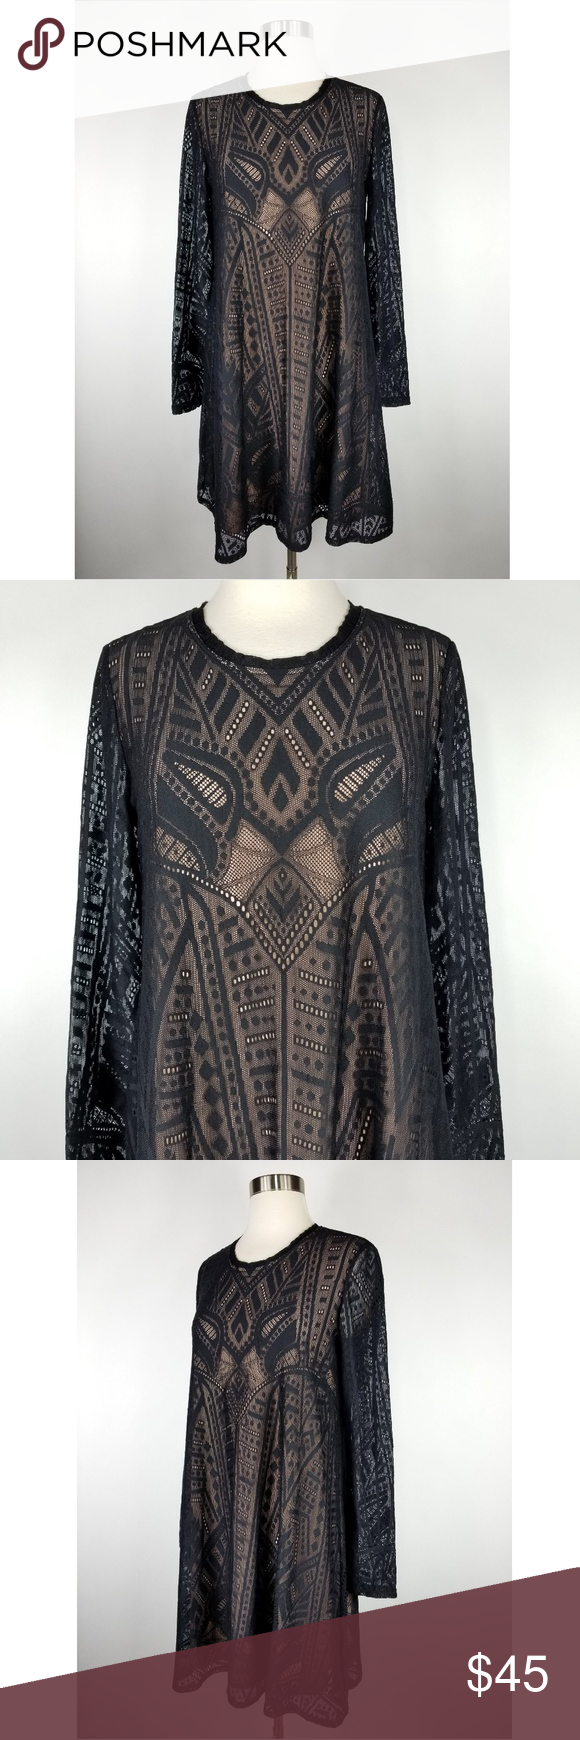 982735b5b0 BCBG Natyly Long Sleeve Black Lace Dress BCBG Max Azria  Natyly  long  sleeve lace